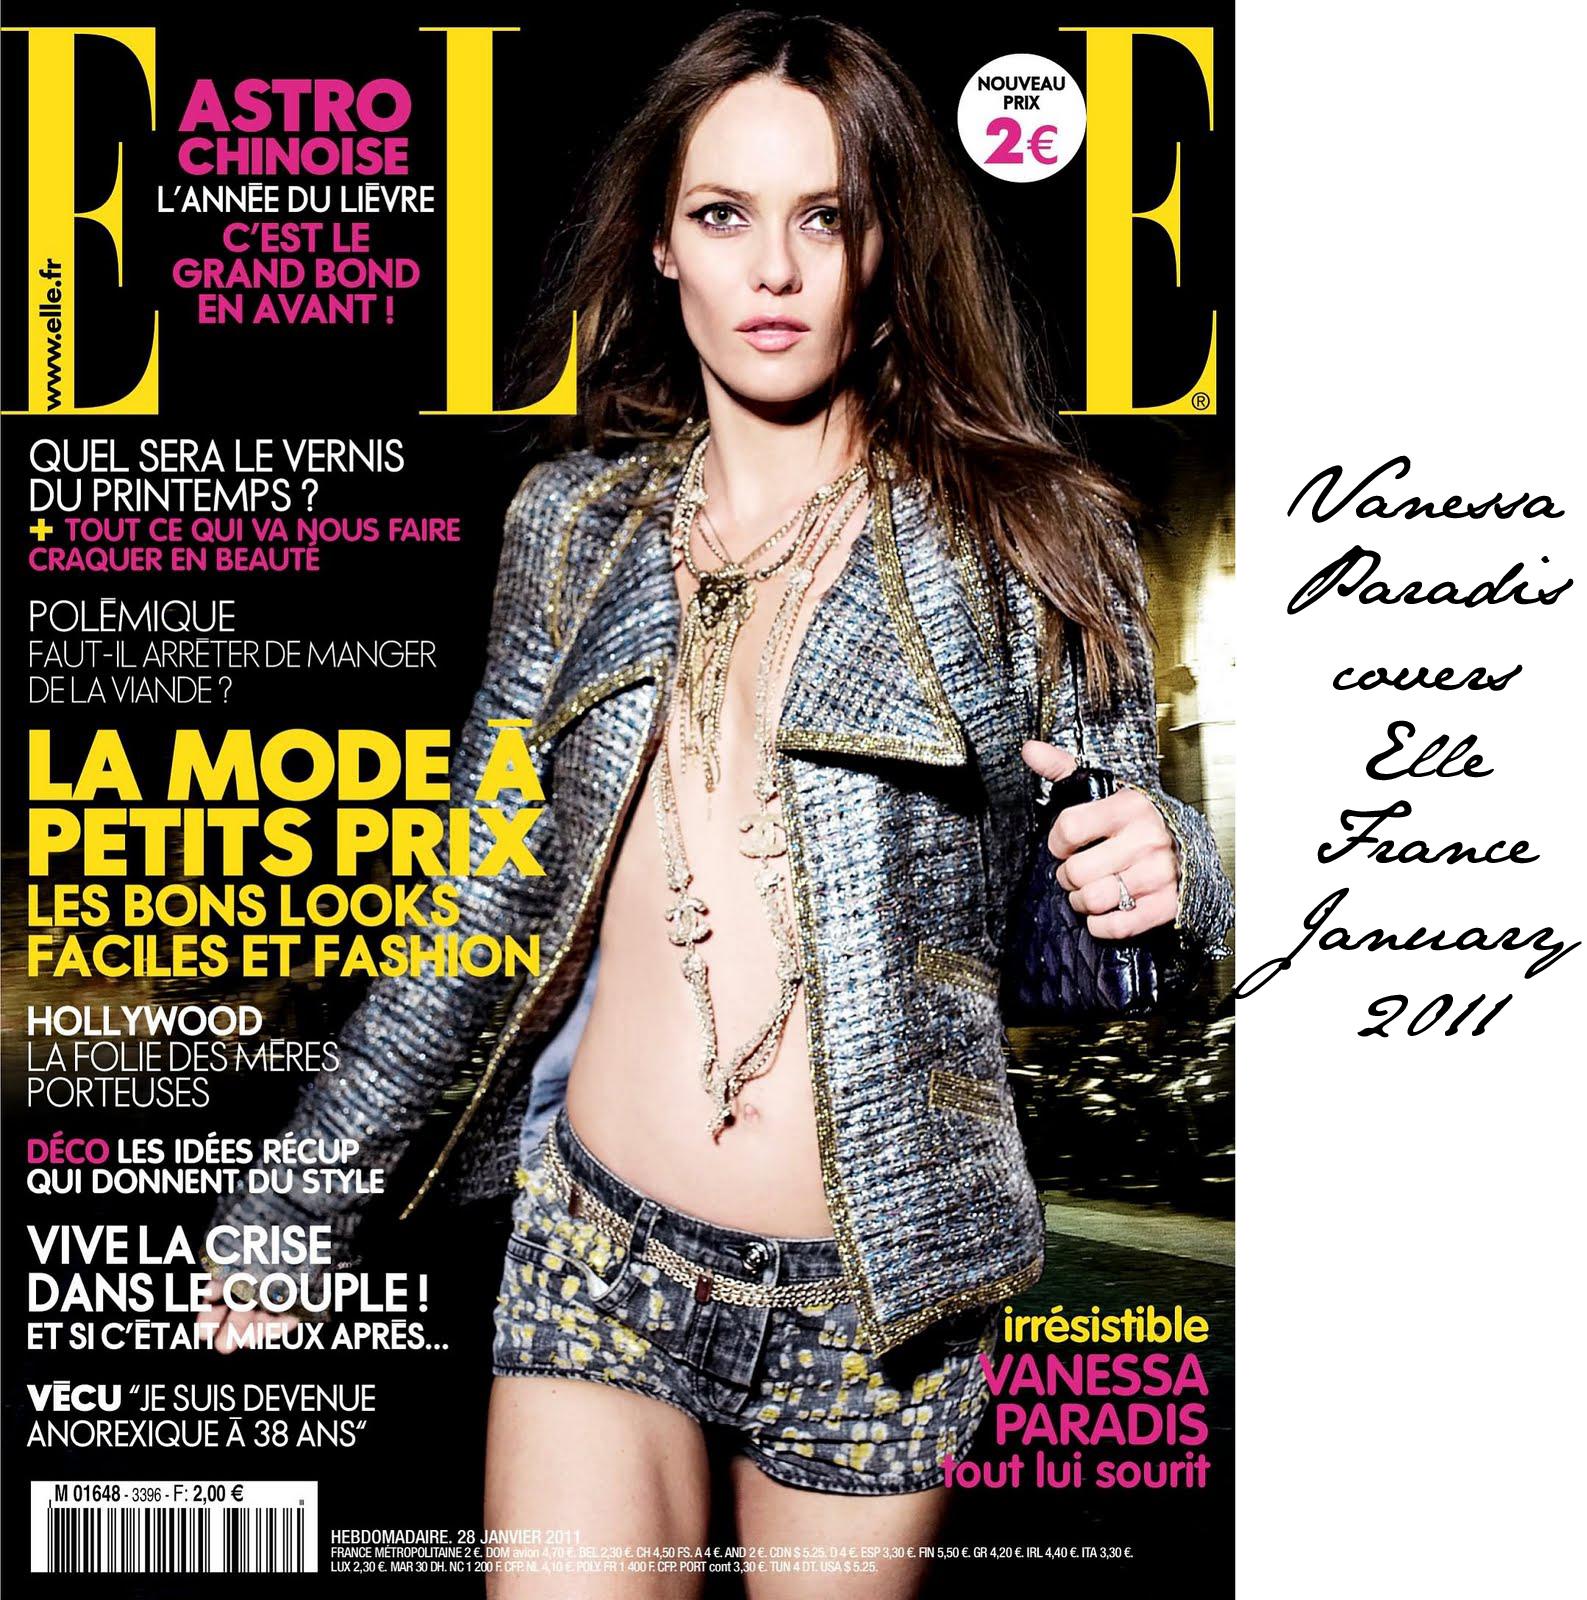 http://2.bp.blogspot.com/_NuQ1asHchXU/TUW4sBbMUgI/AAAAAAAAP-0/TJxZPx8v1VQ/s1600/Vanessa+Paradis+Elle+France.jpg